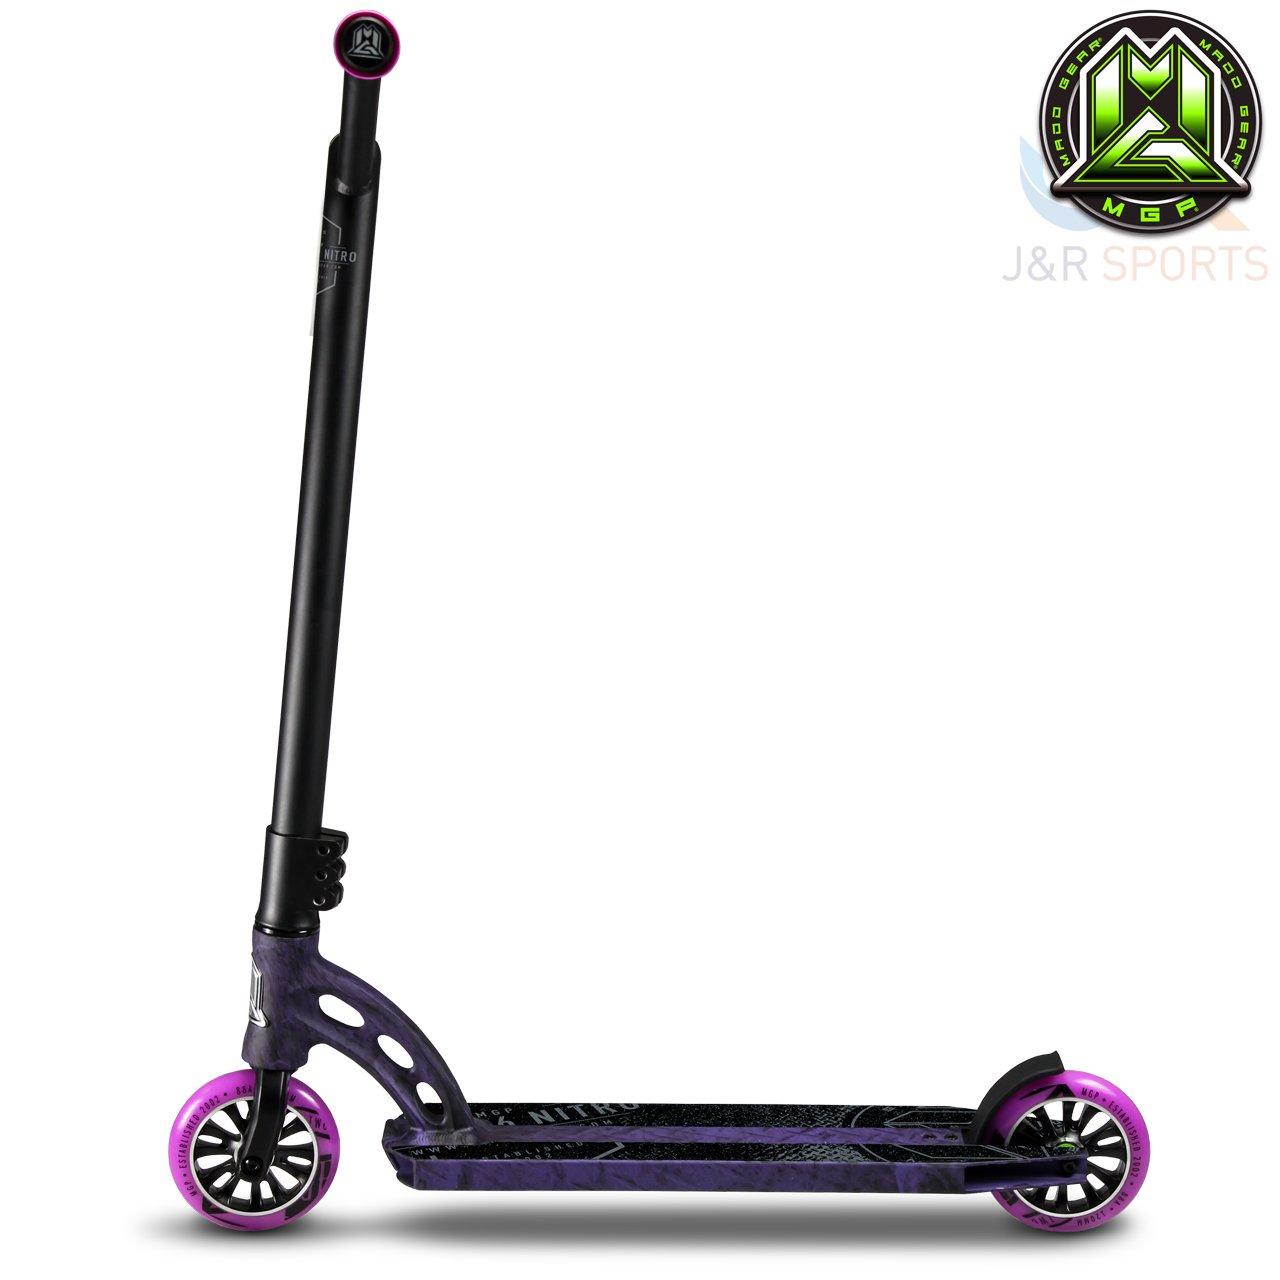 Amazon.com: MGP Madd Gear VX6 Nitro Scooter: Sports & Outdoors